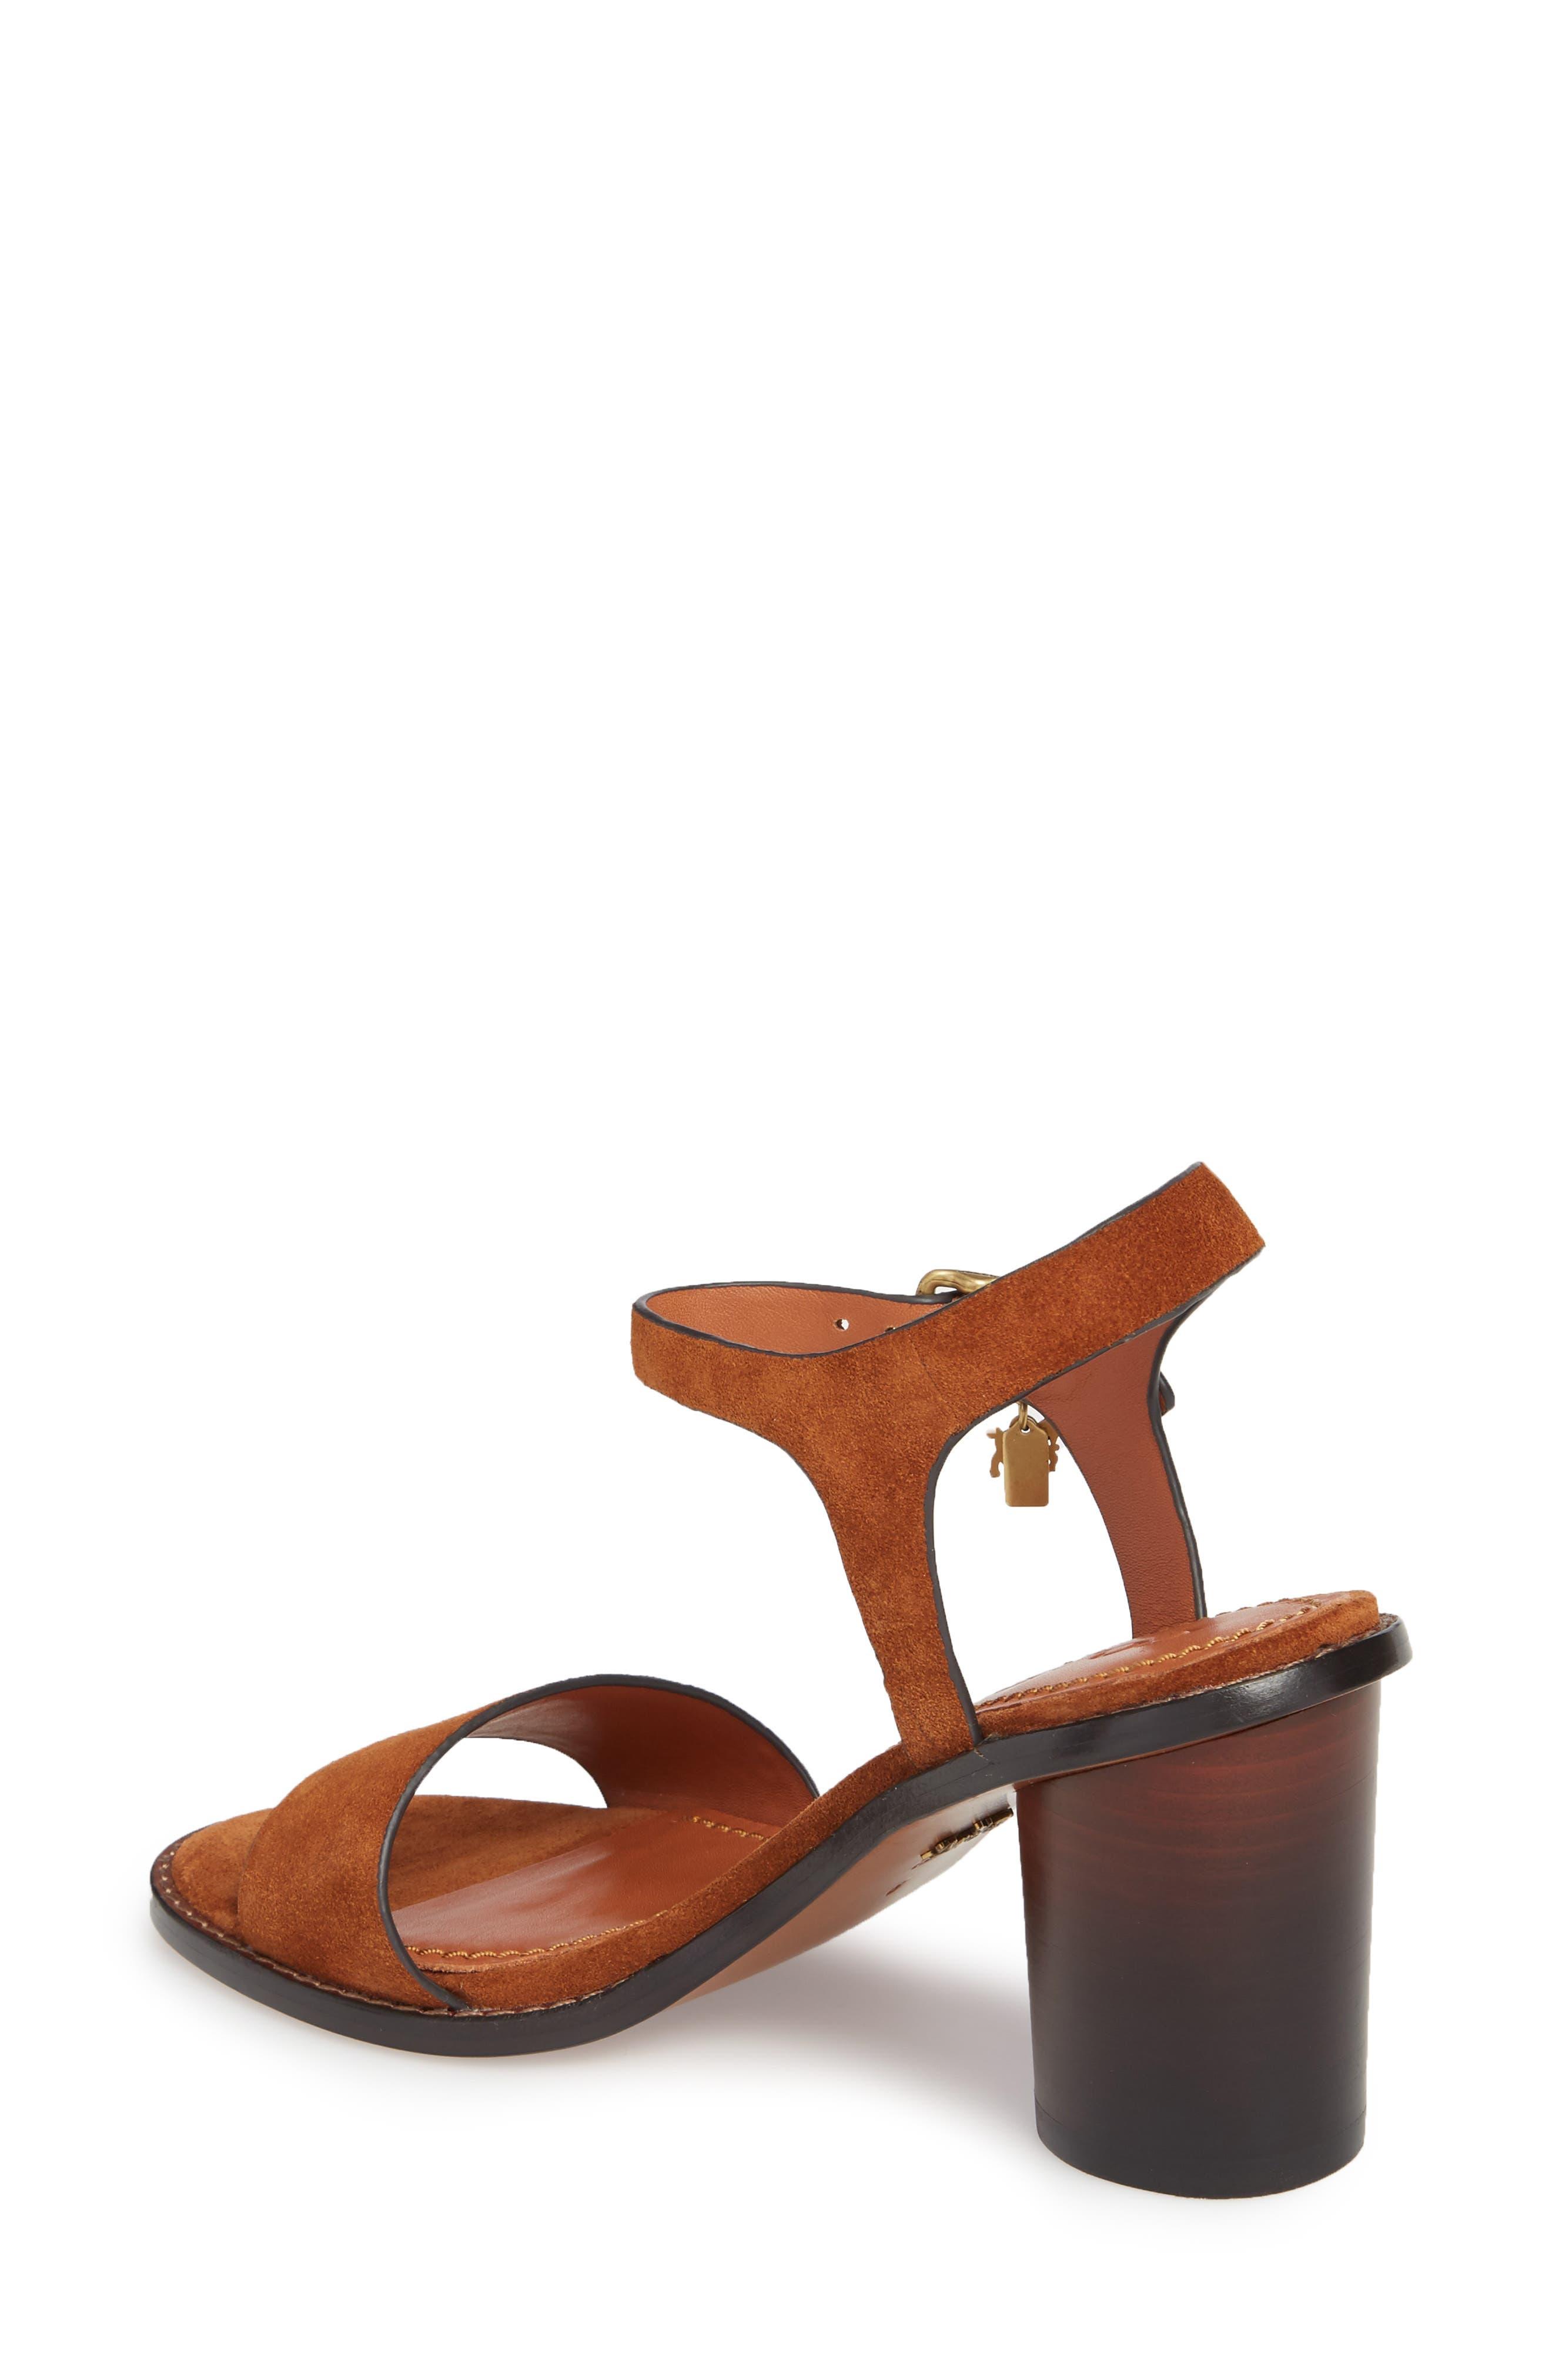 Column Heel Sandal,                             Alternate thumbnail 2, color,                             Saddle Suede